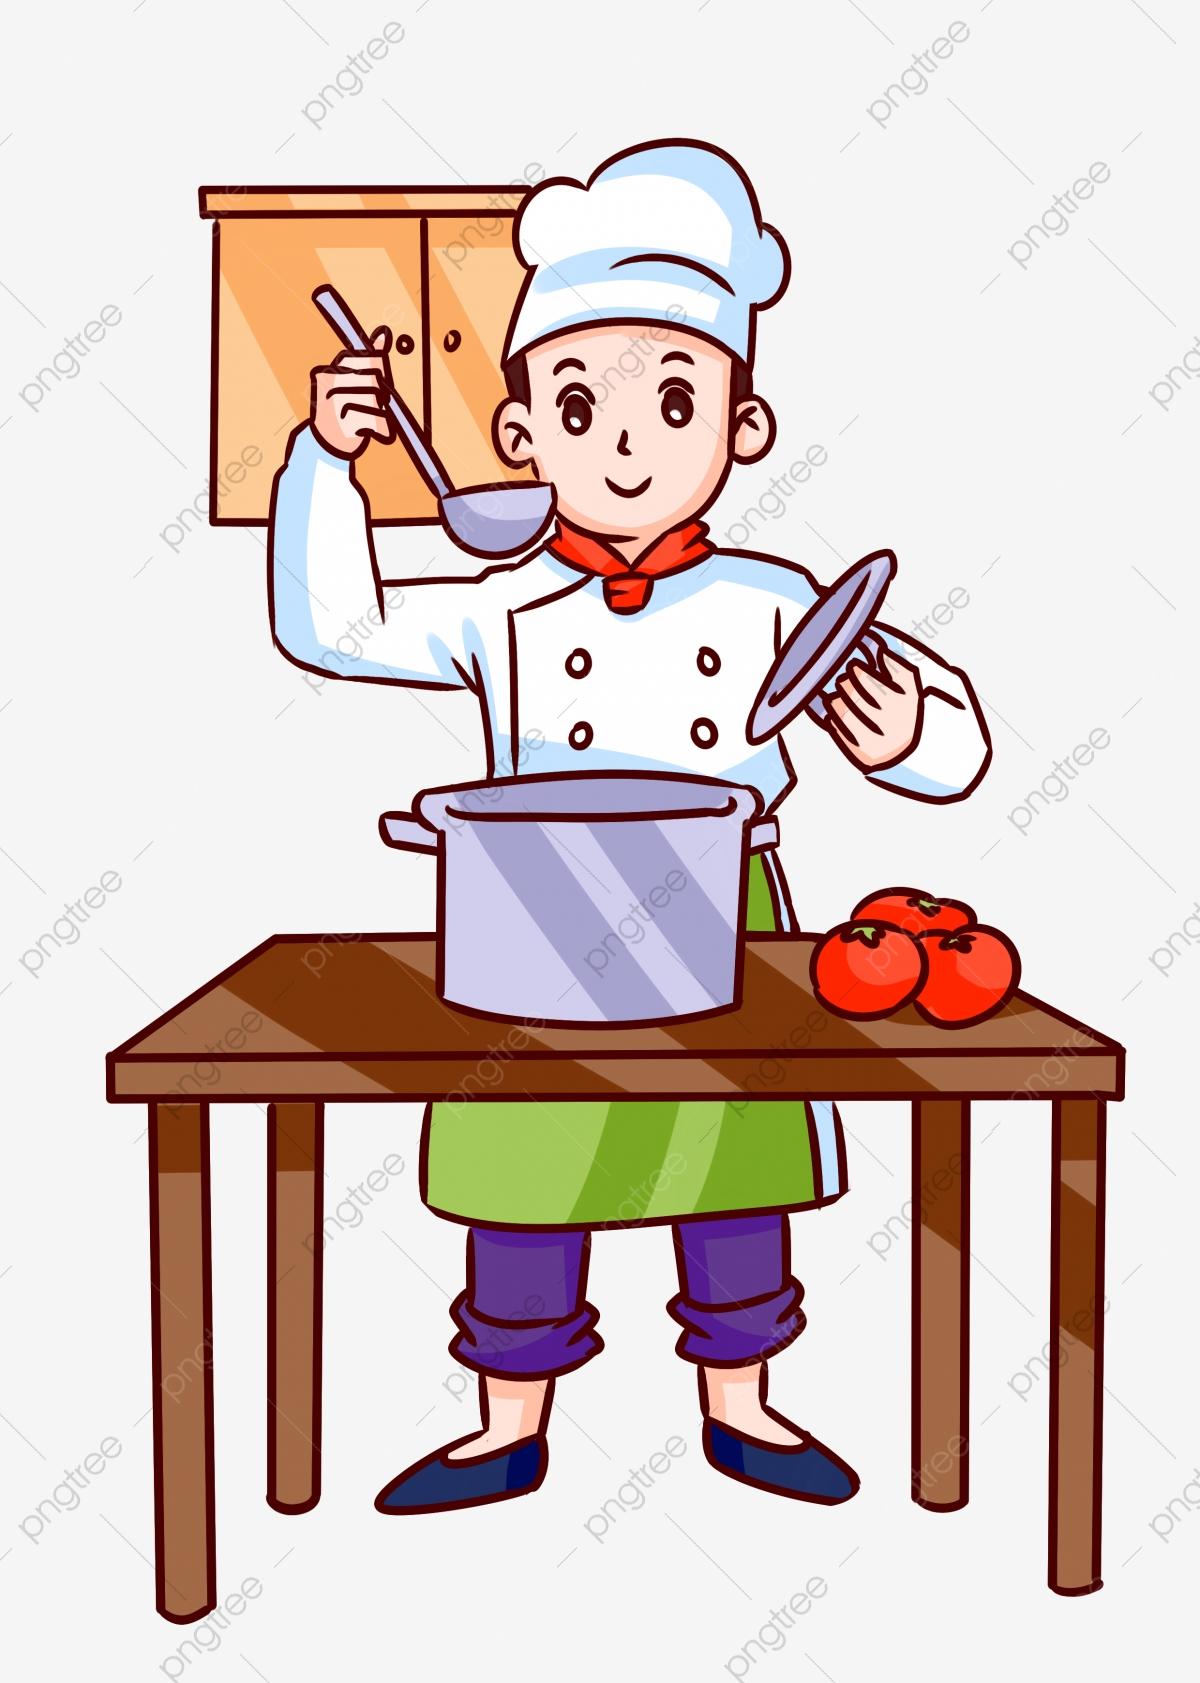 Food taste salty illustration. Chef clipart hotel chef